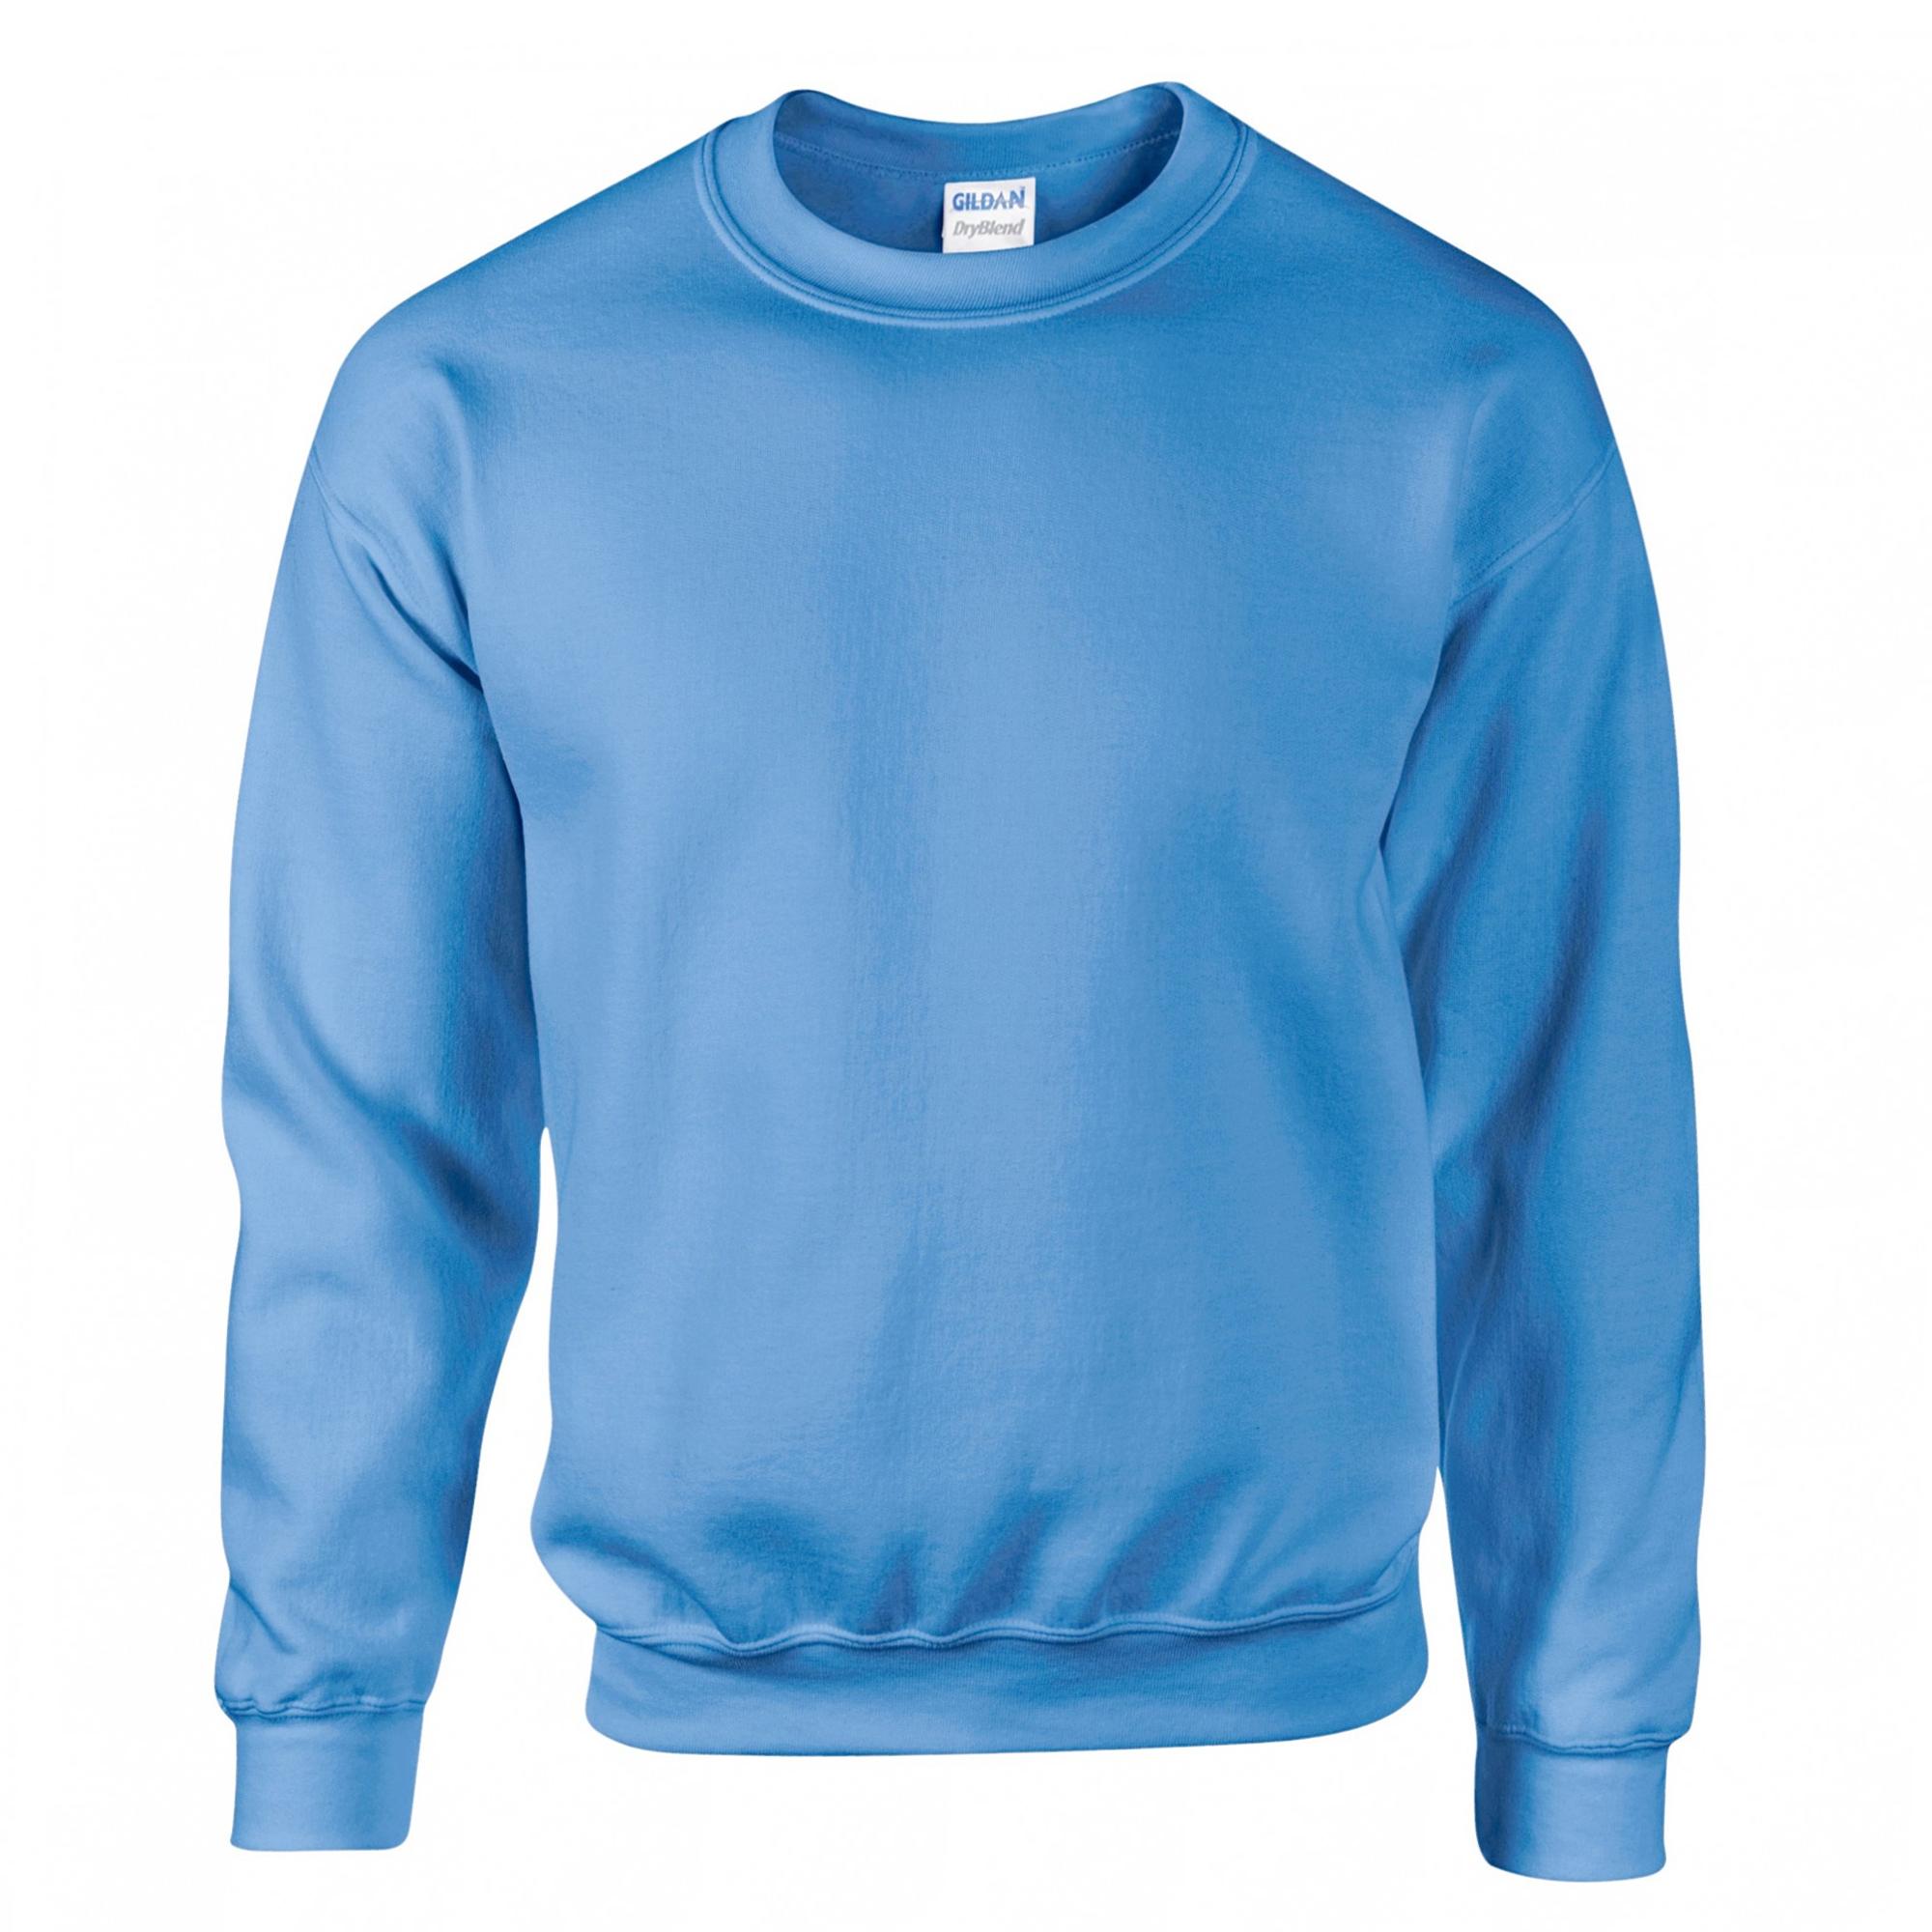 Gildan-Sudadera-cuello-redondo-mangas-Set-in-Modelo-DryBlend-Adultos-13-color